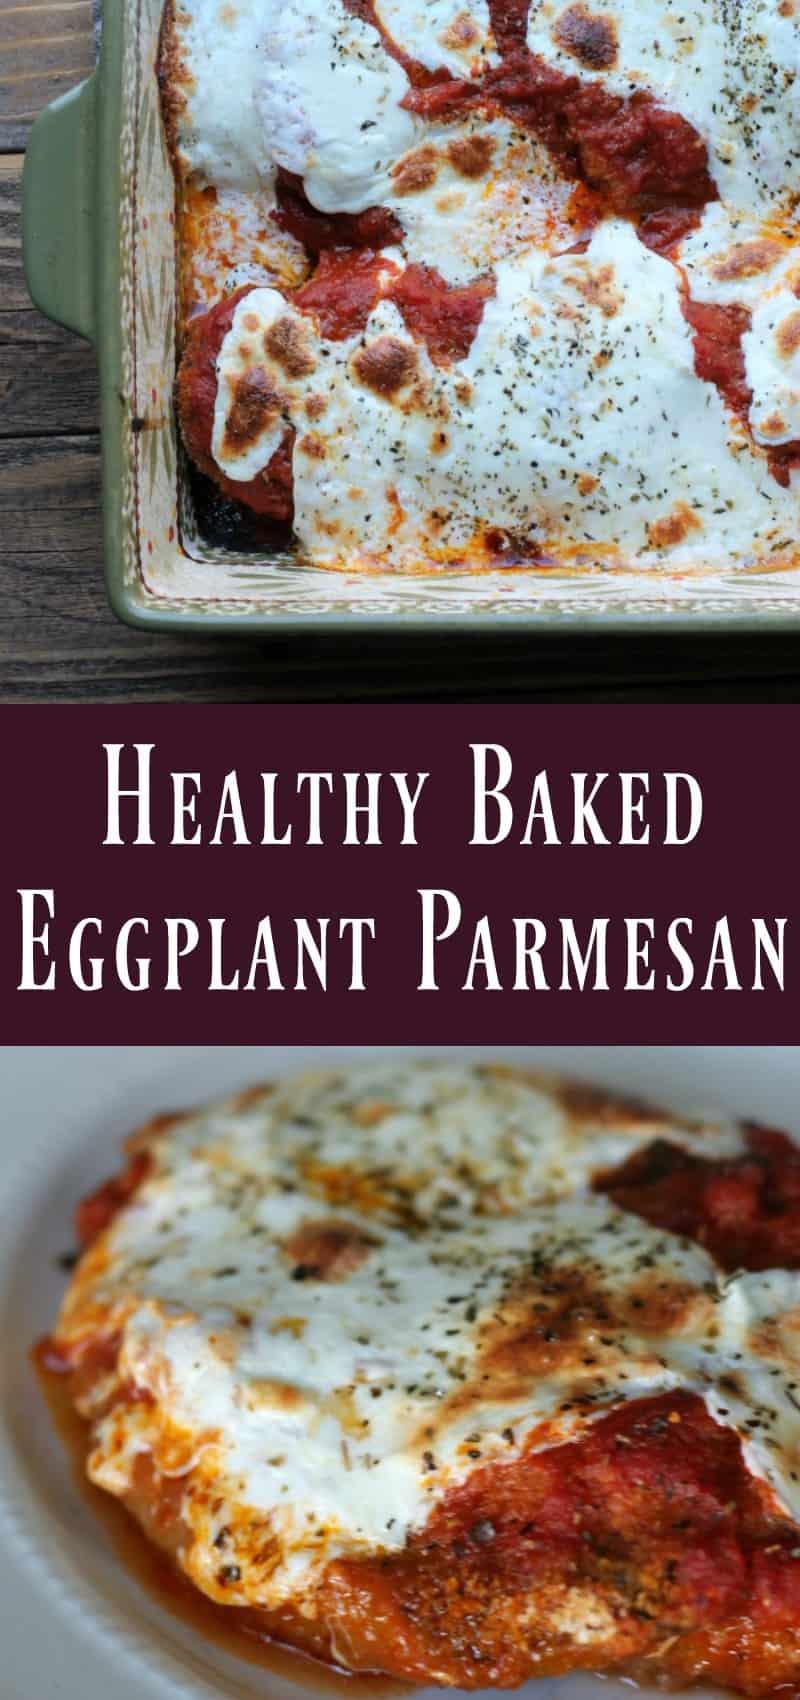 Healthy baked eggplant parmesan recipe